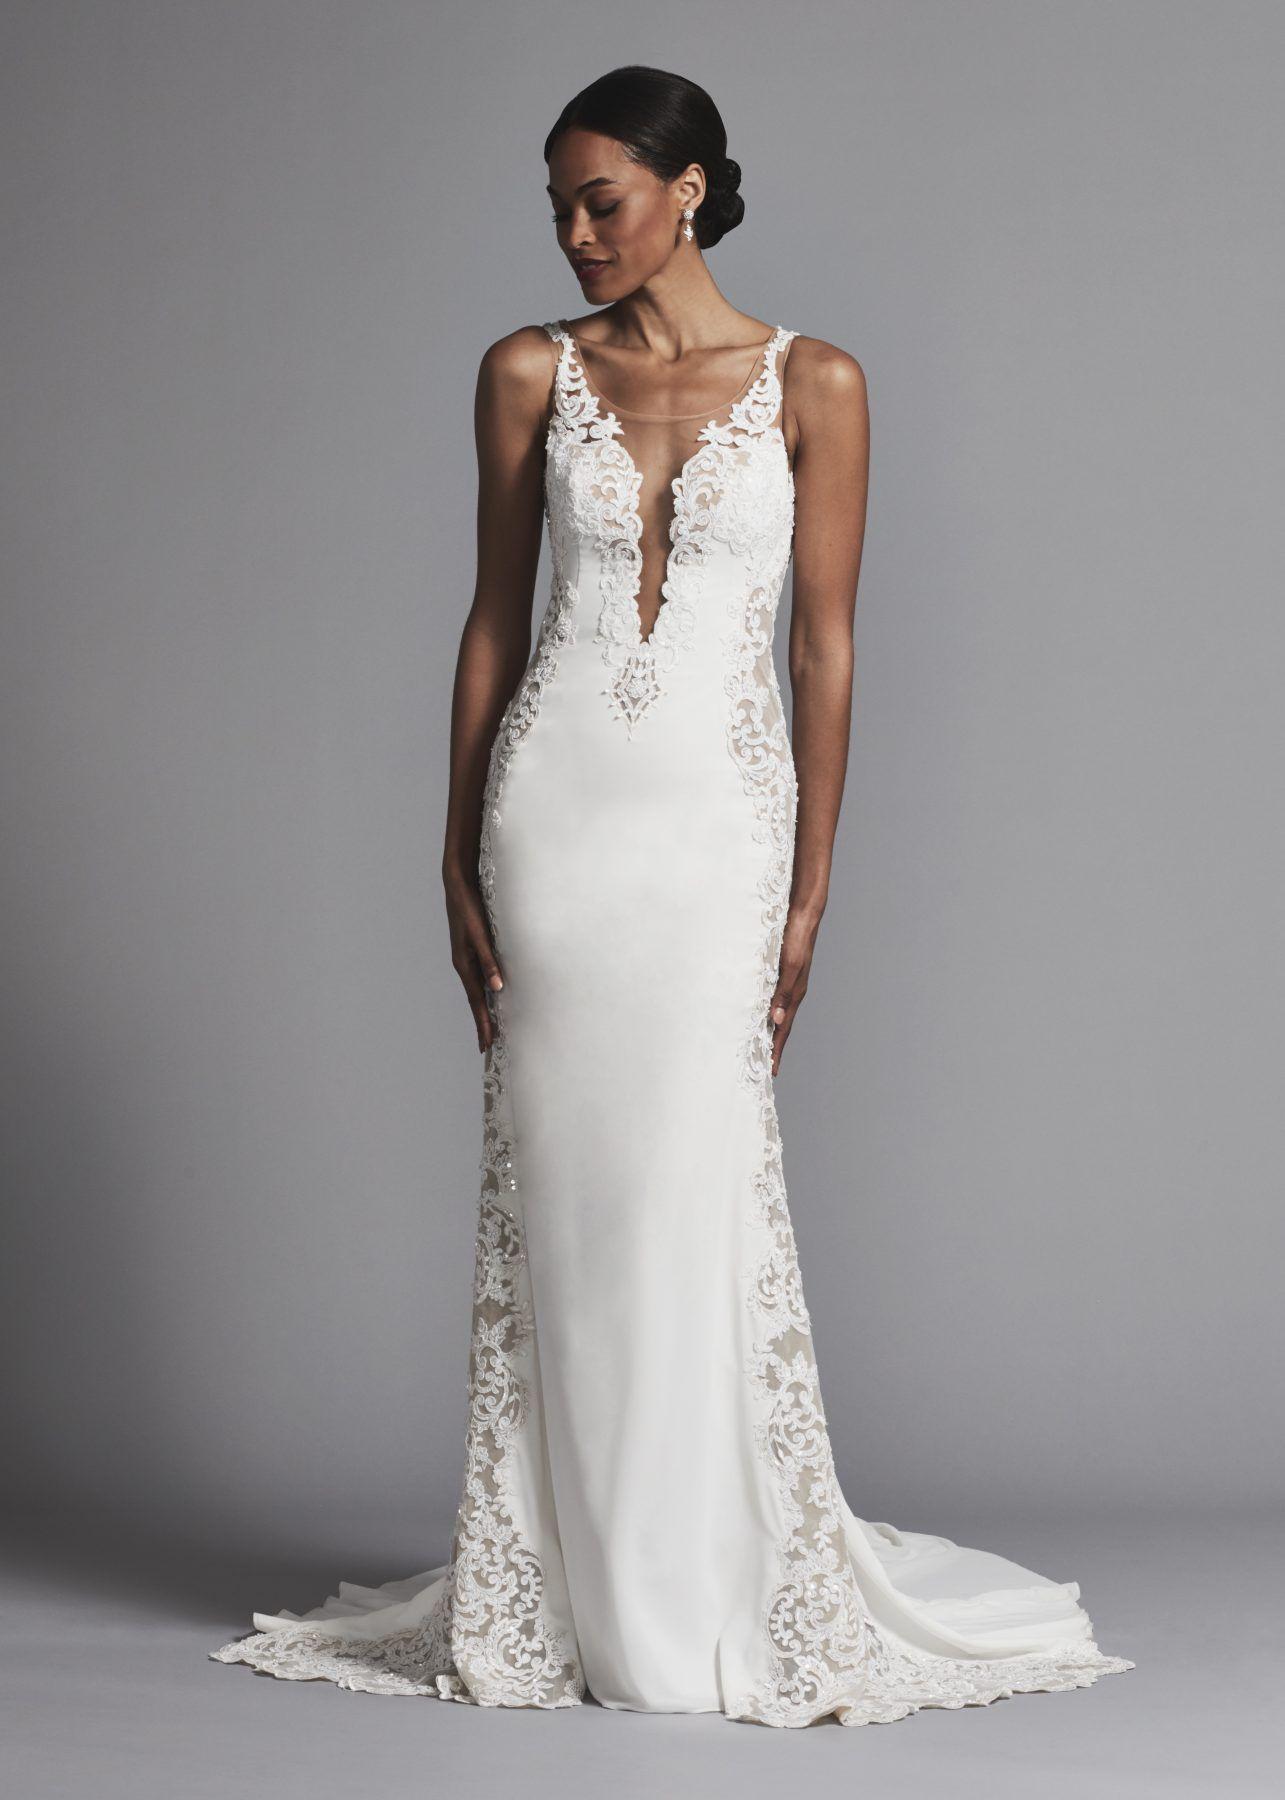 Sheath illusion wedding dress with lace cutouts and deep vneckline